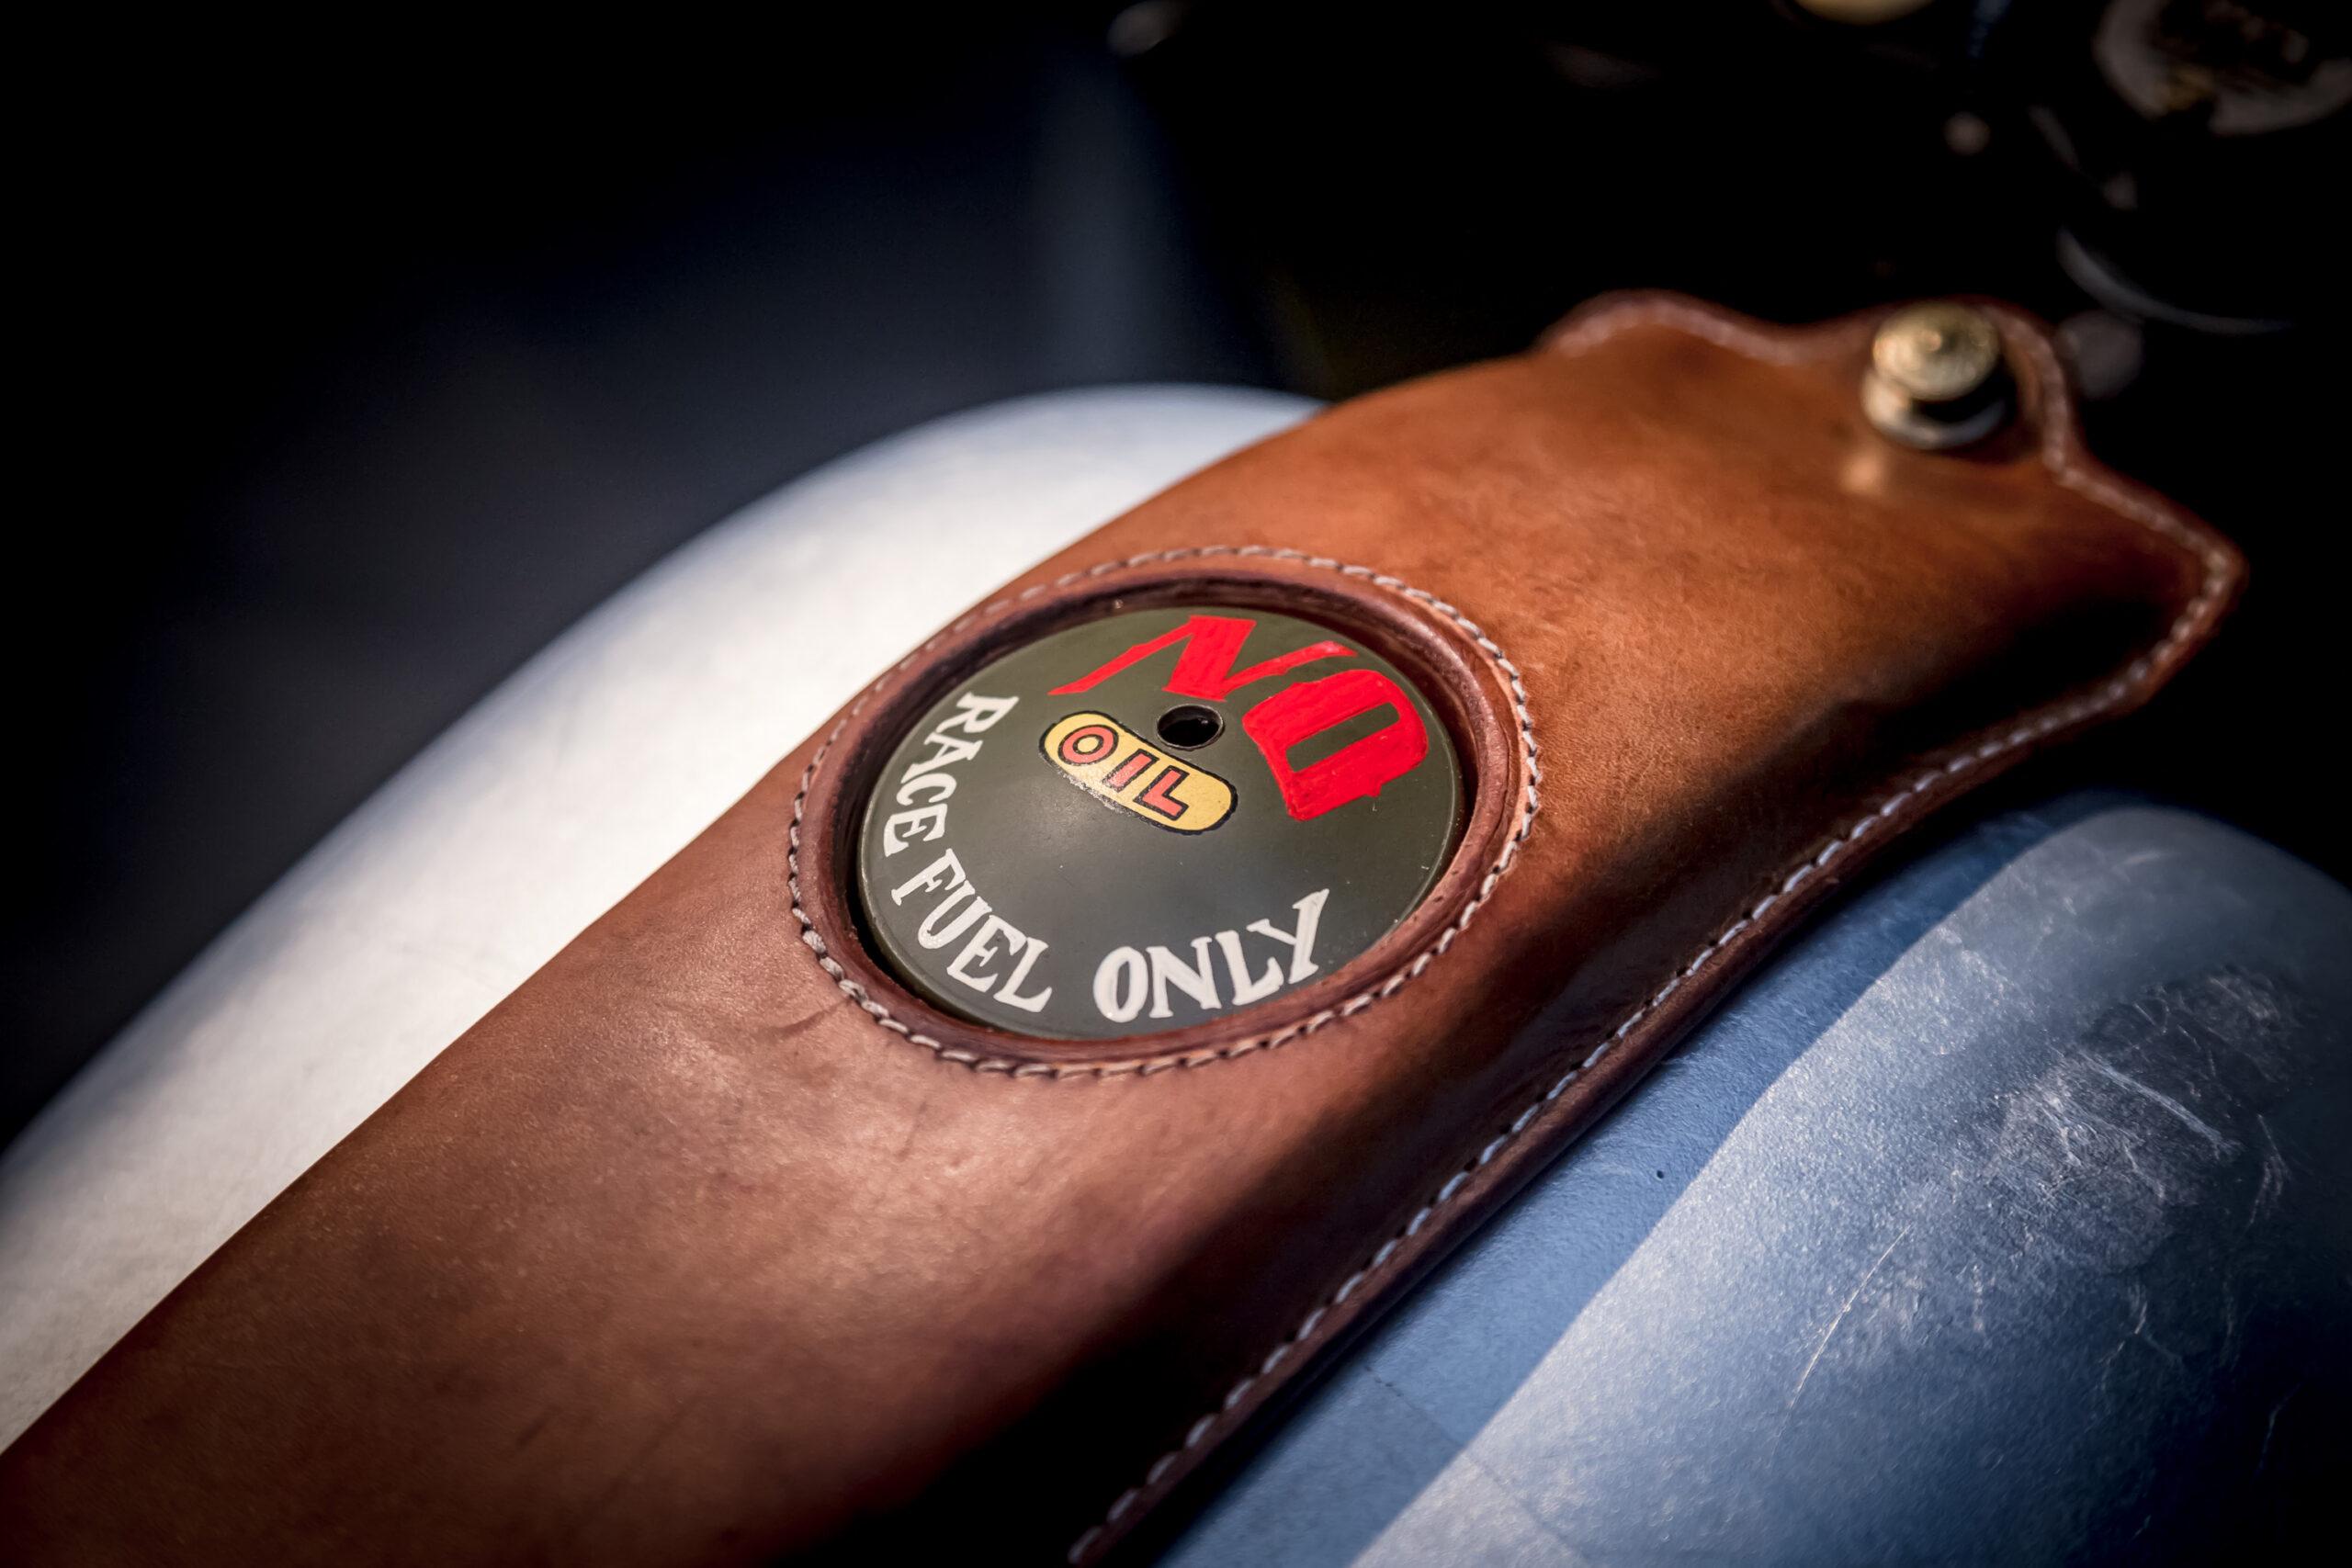 Harley Davidson petrol tank details